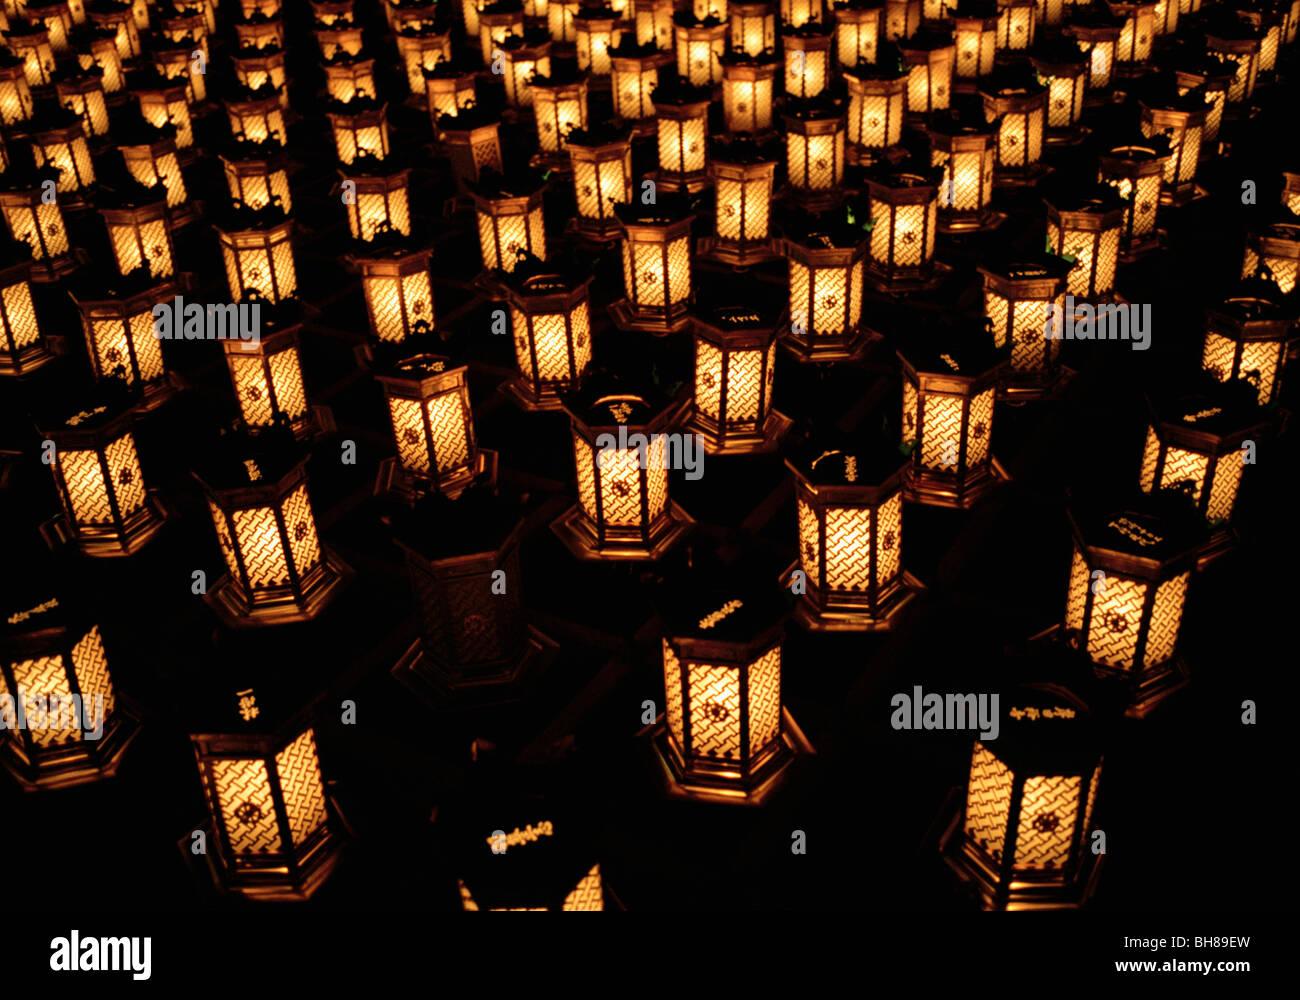 Beleuchtete Laternen in Reihen, Miyajima, Japan angeordnet Stockfoto